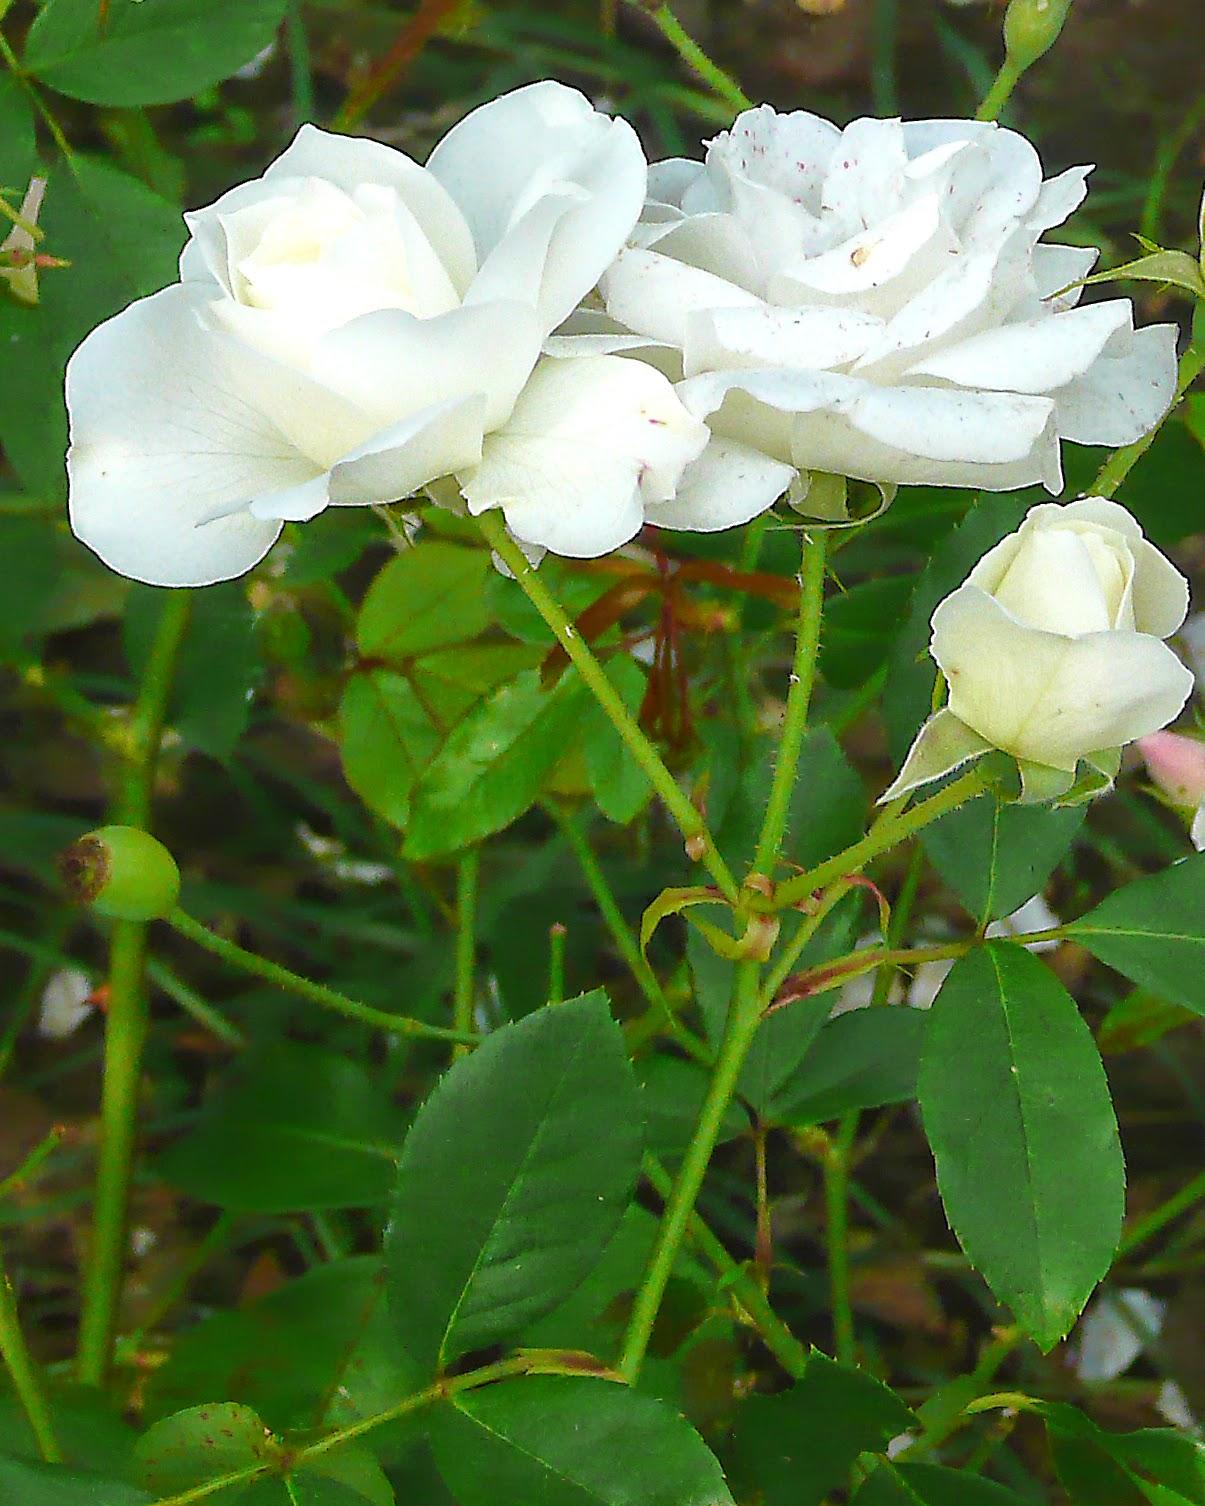 Ramillete de flores blancas